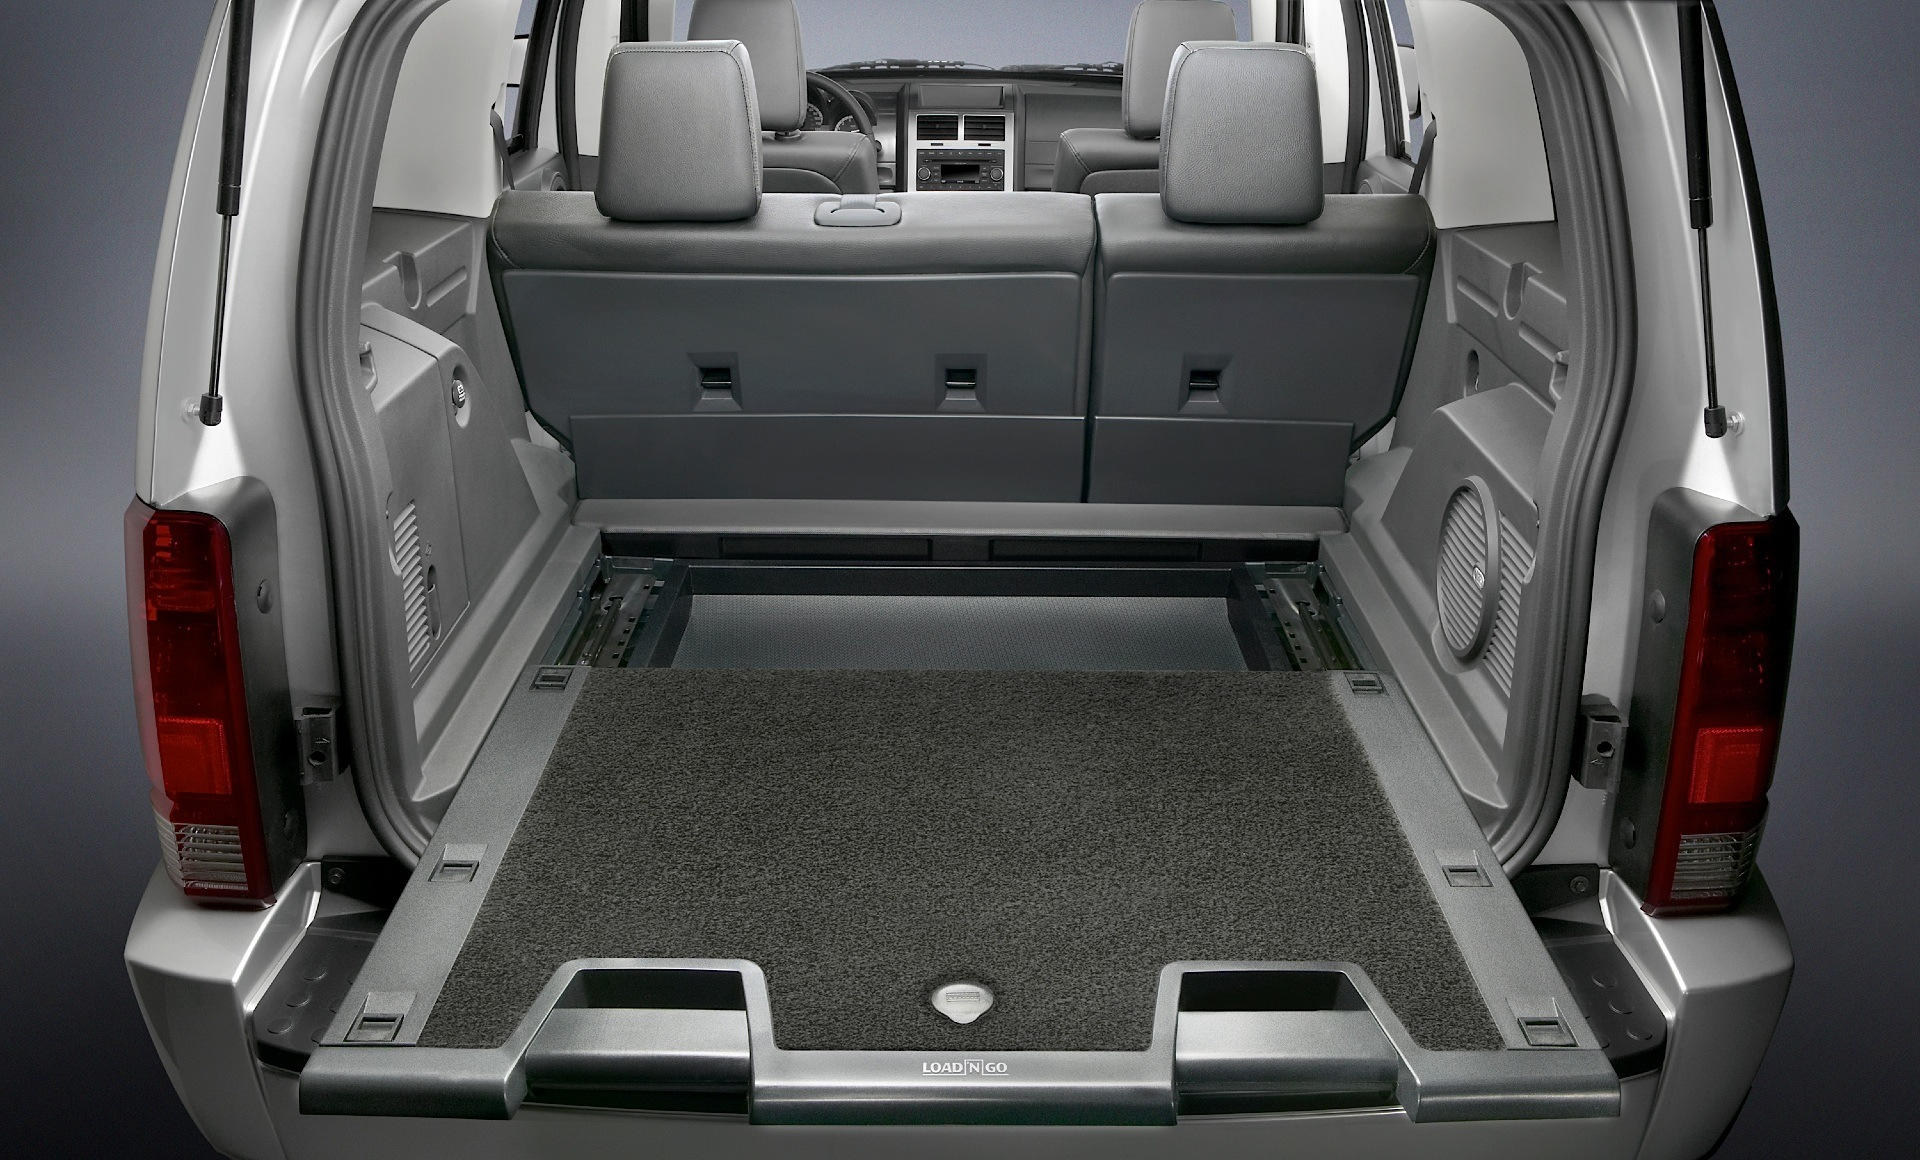 Dodge nitro specs 2006 2007 2008 2009 2010 2011 2012 dodge nitro 2006 2012 publicscrutiny Images